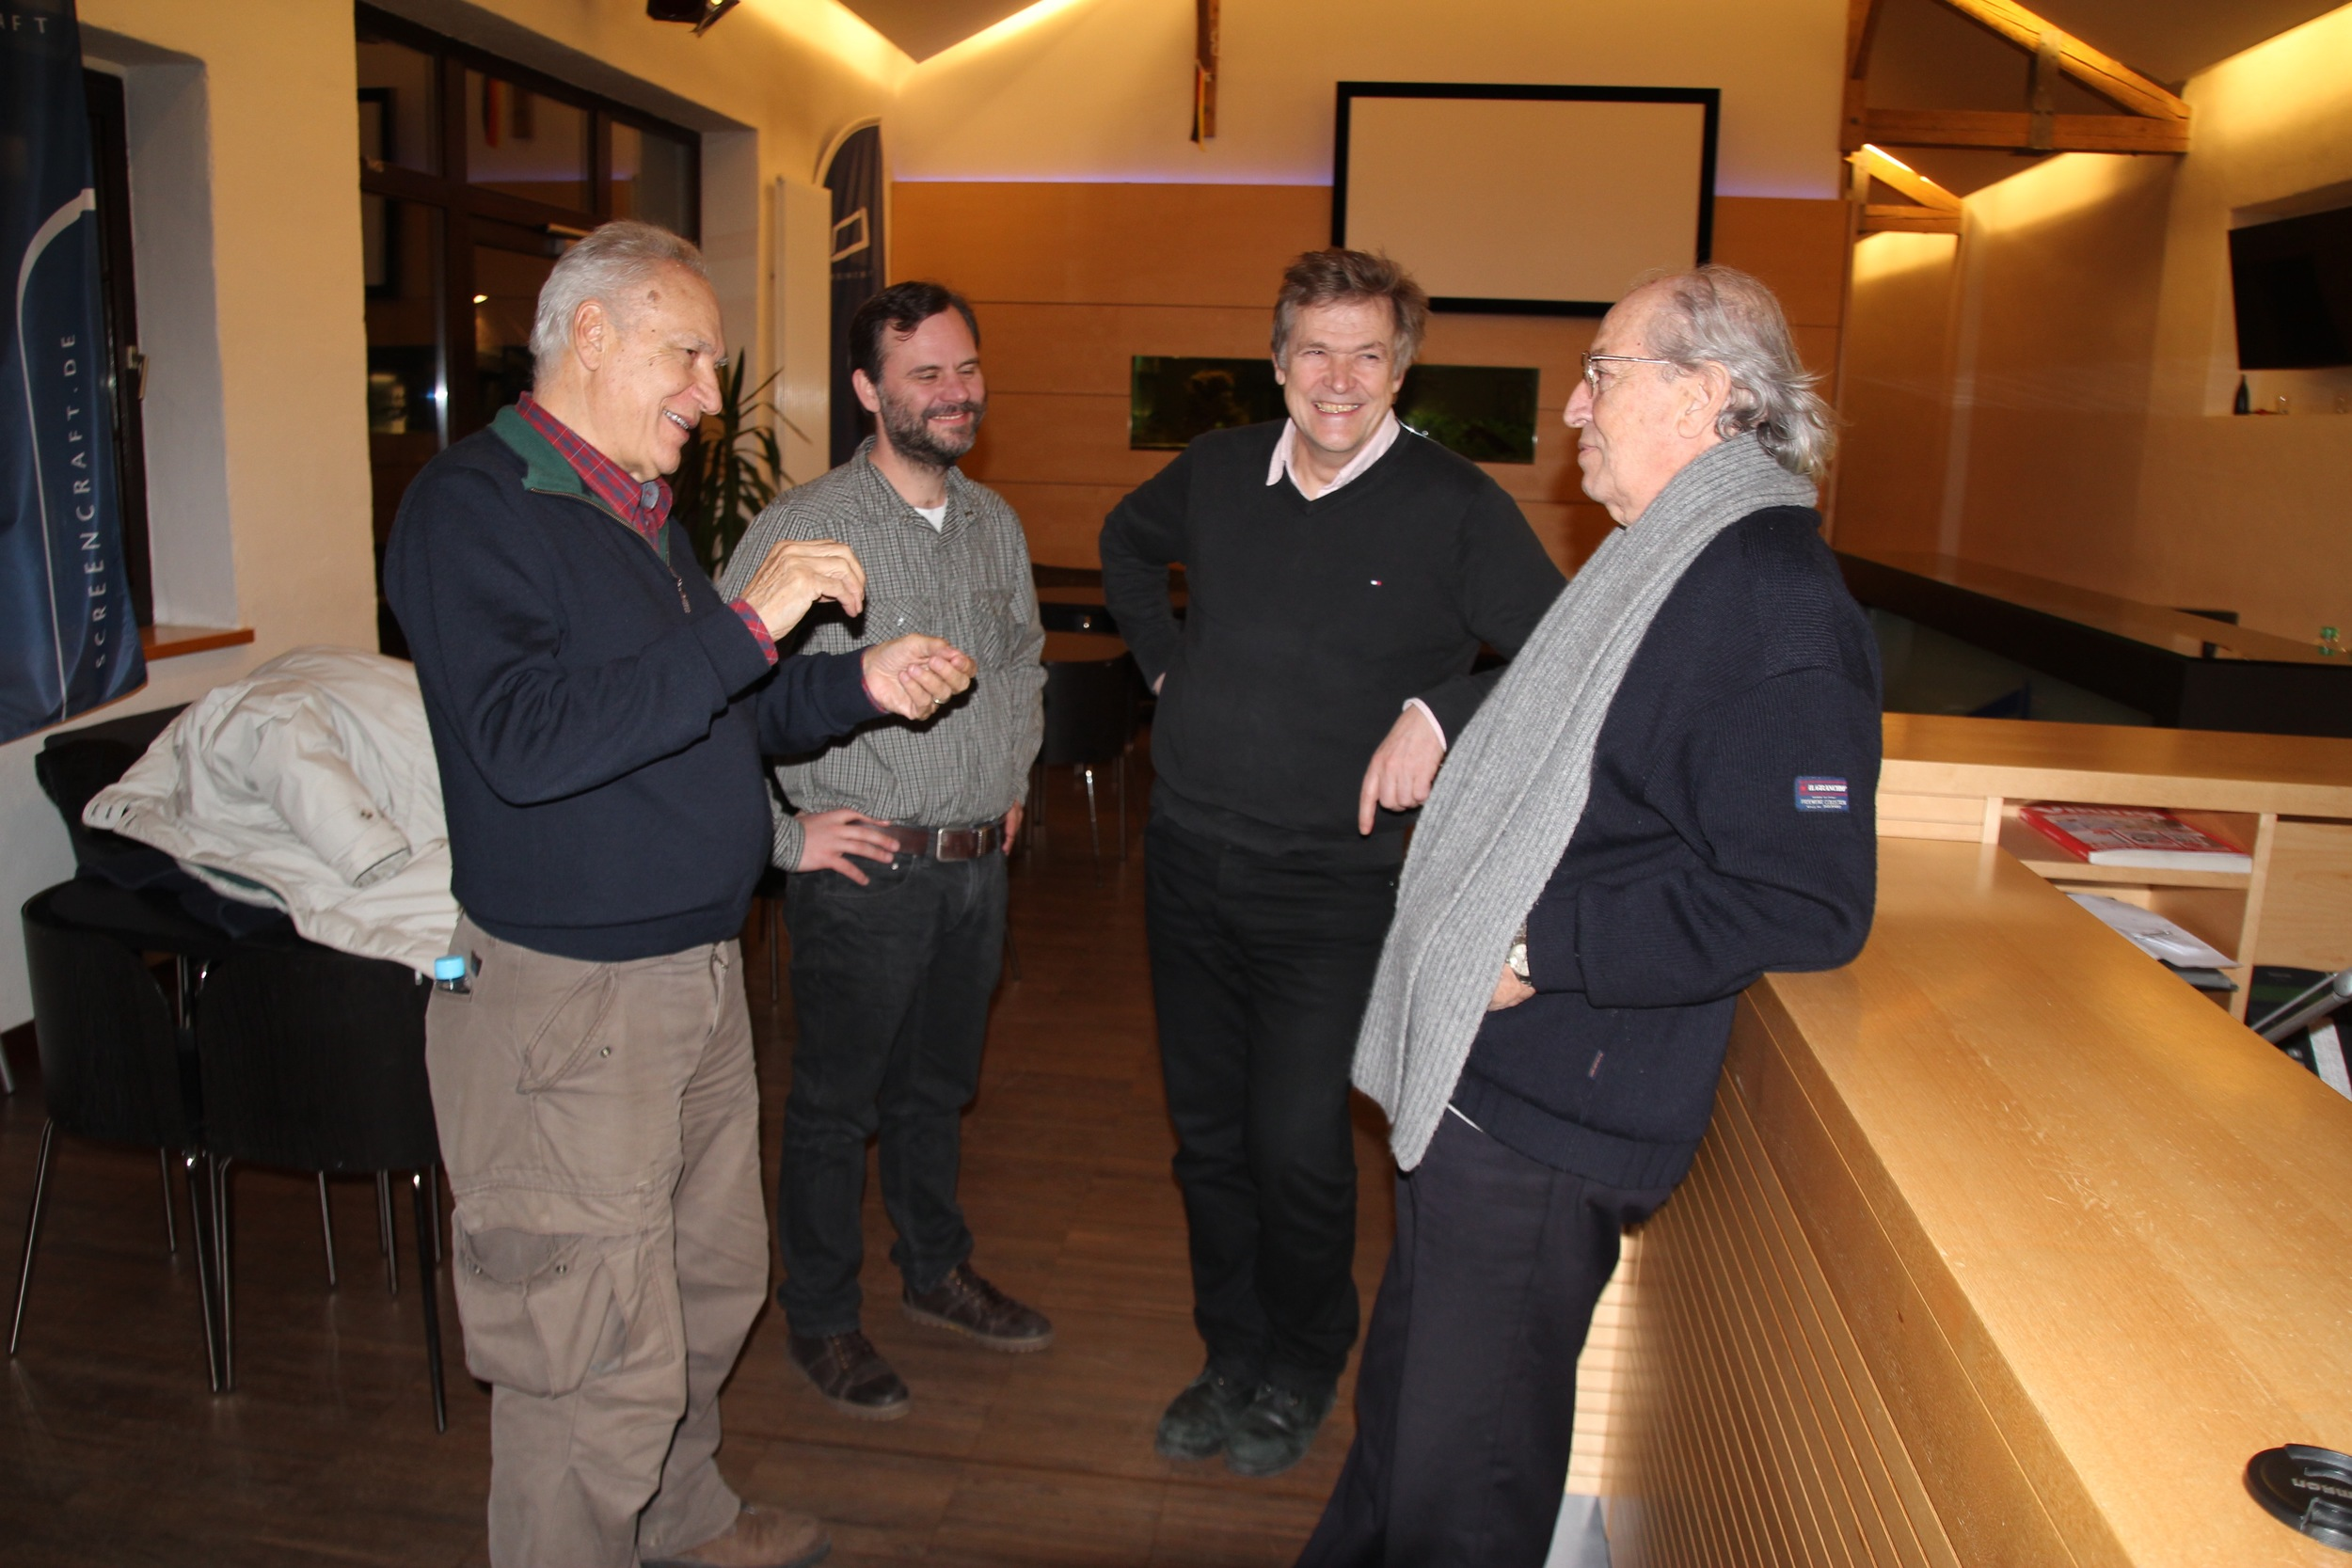 , Vittorio Storaro, Matthias Sternberg, Michael Hieber